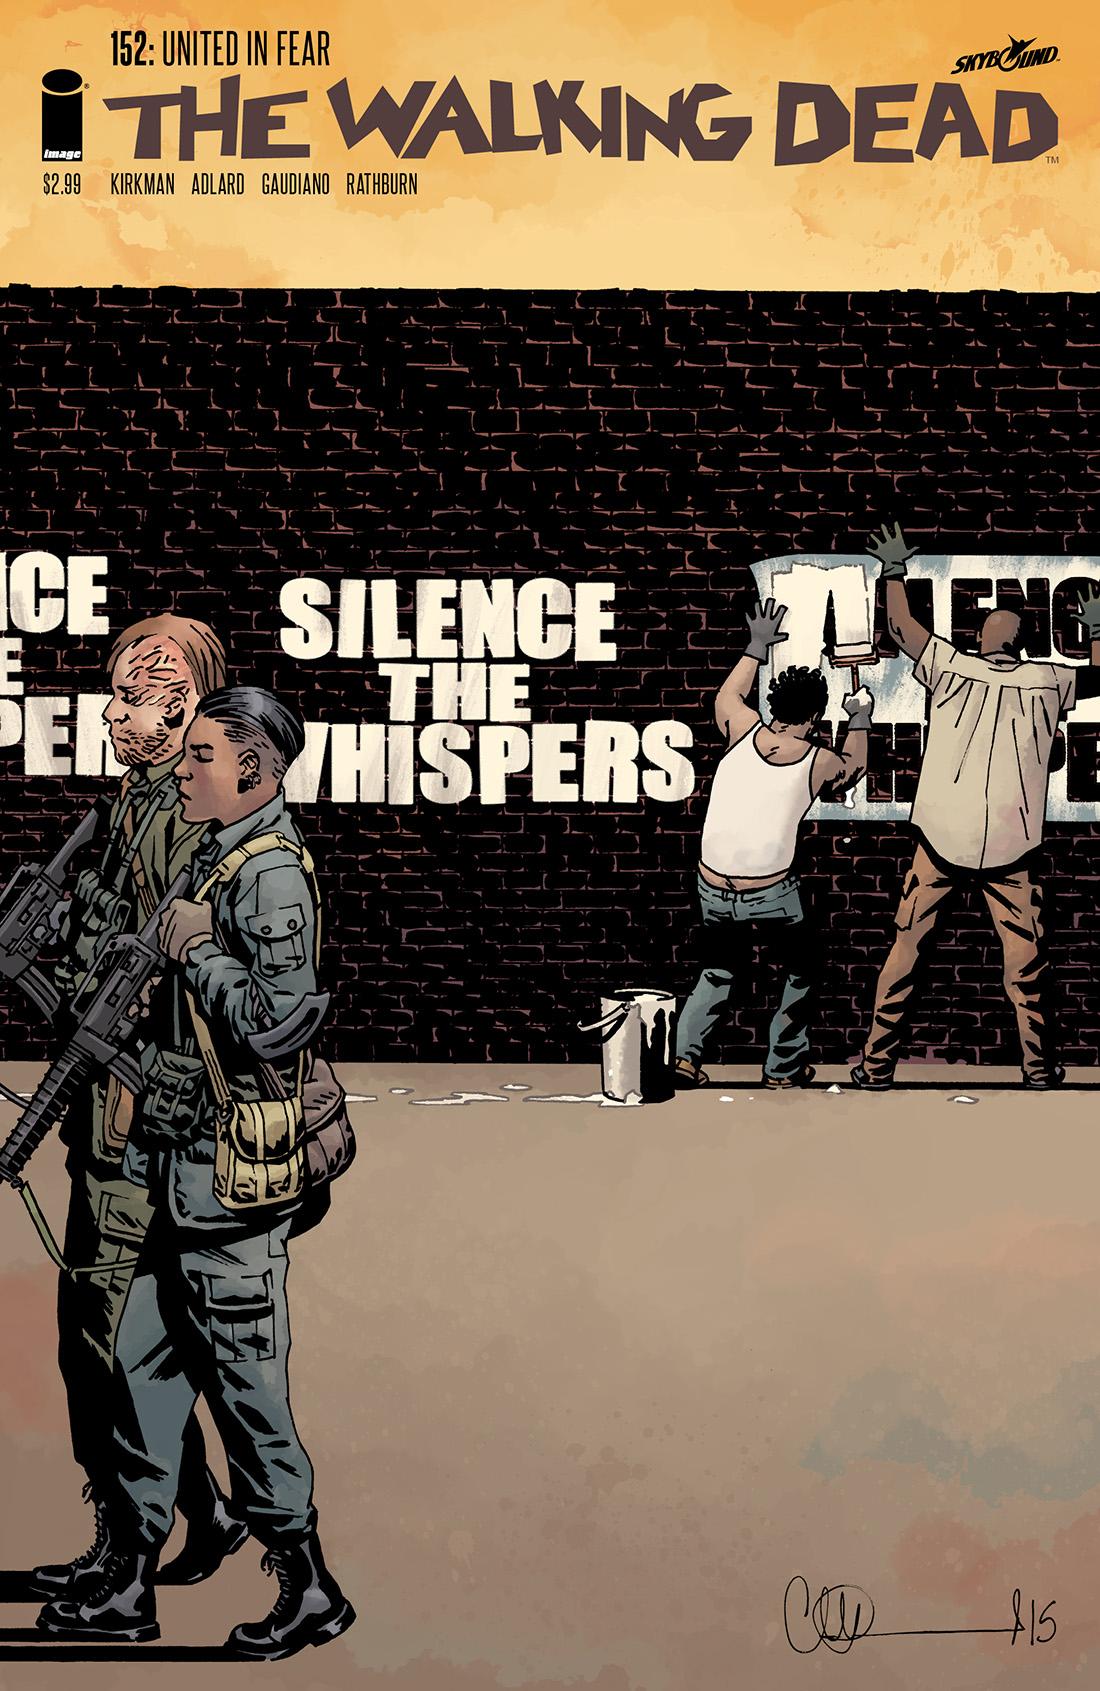 The Walking Dead Issue 152